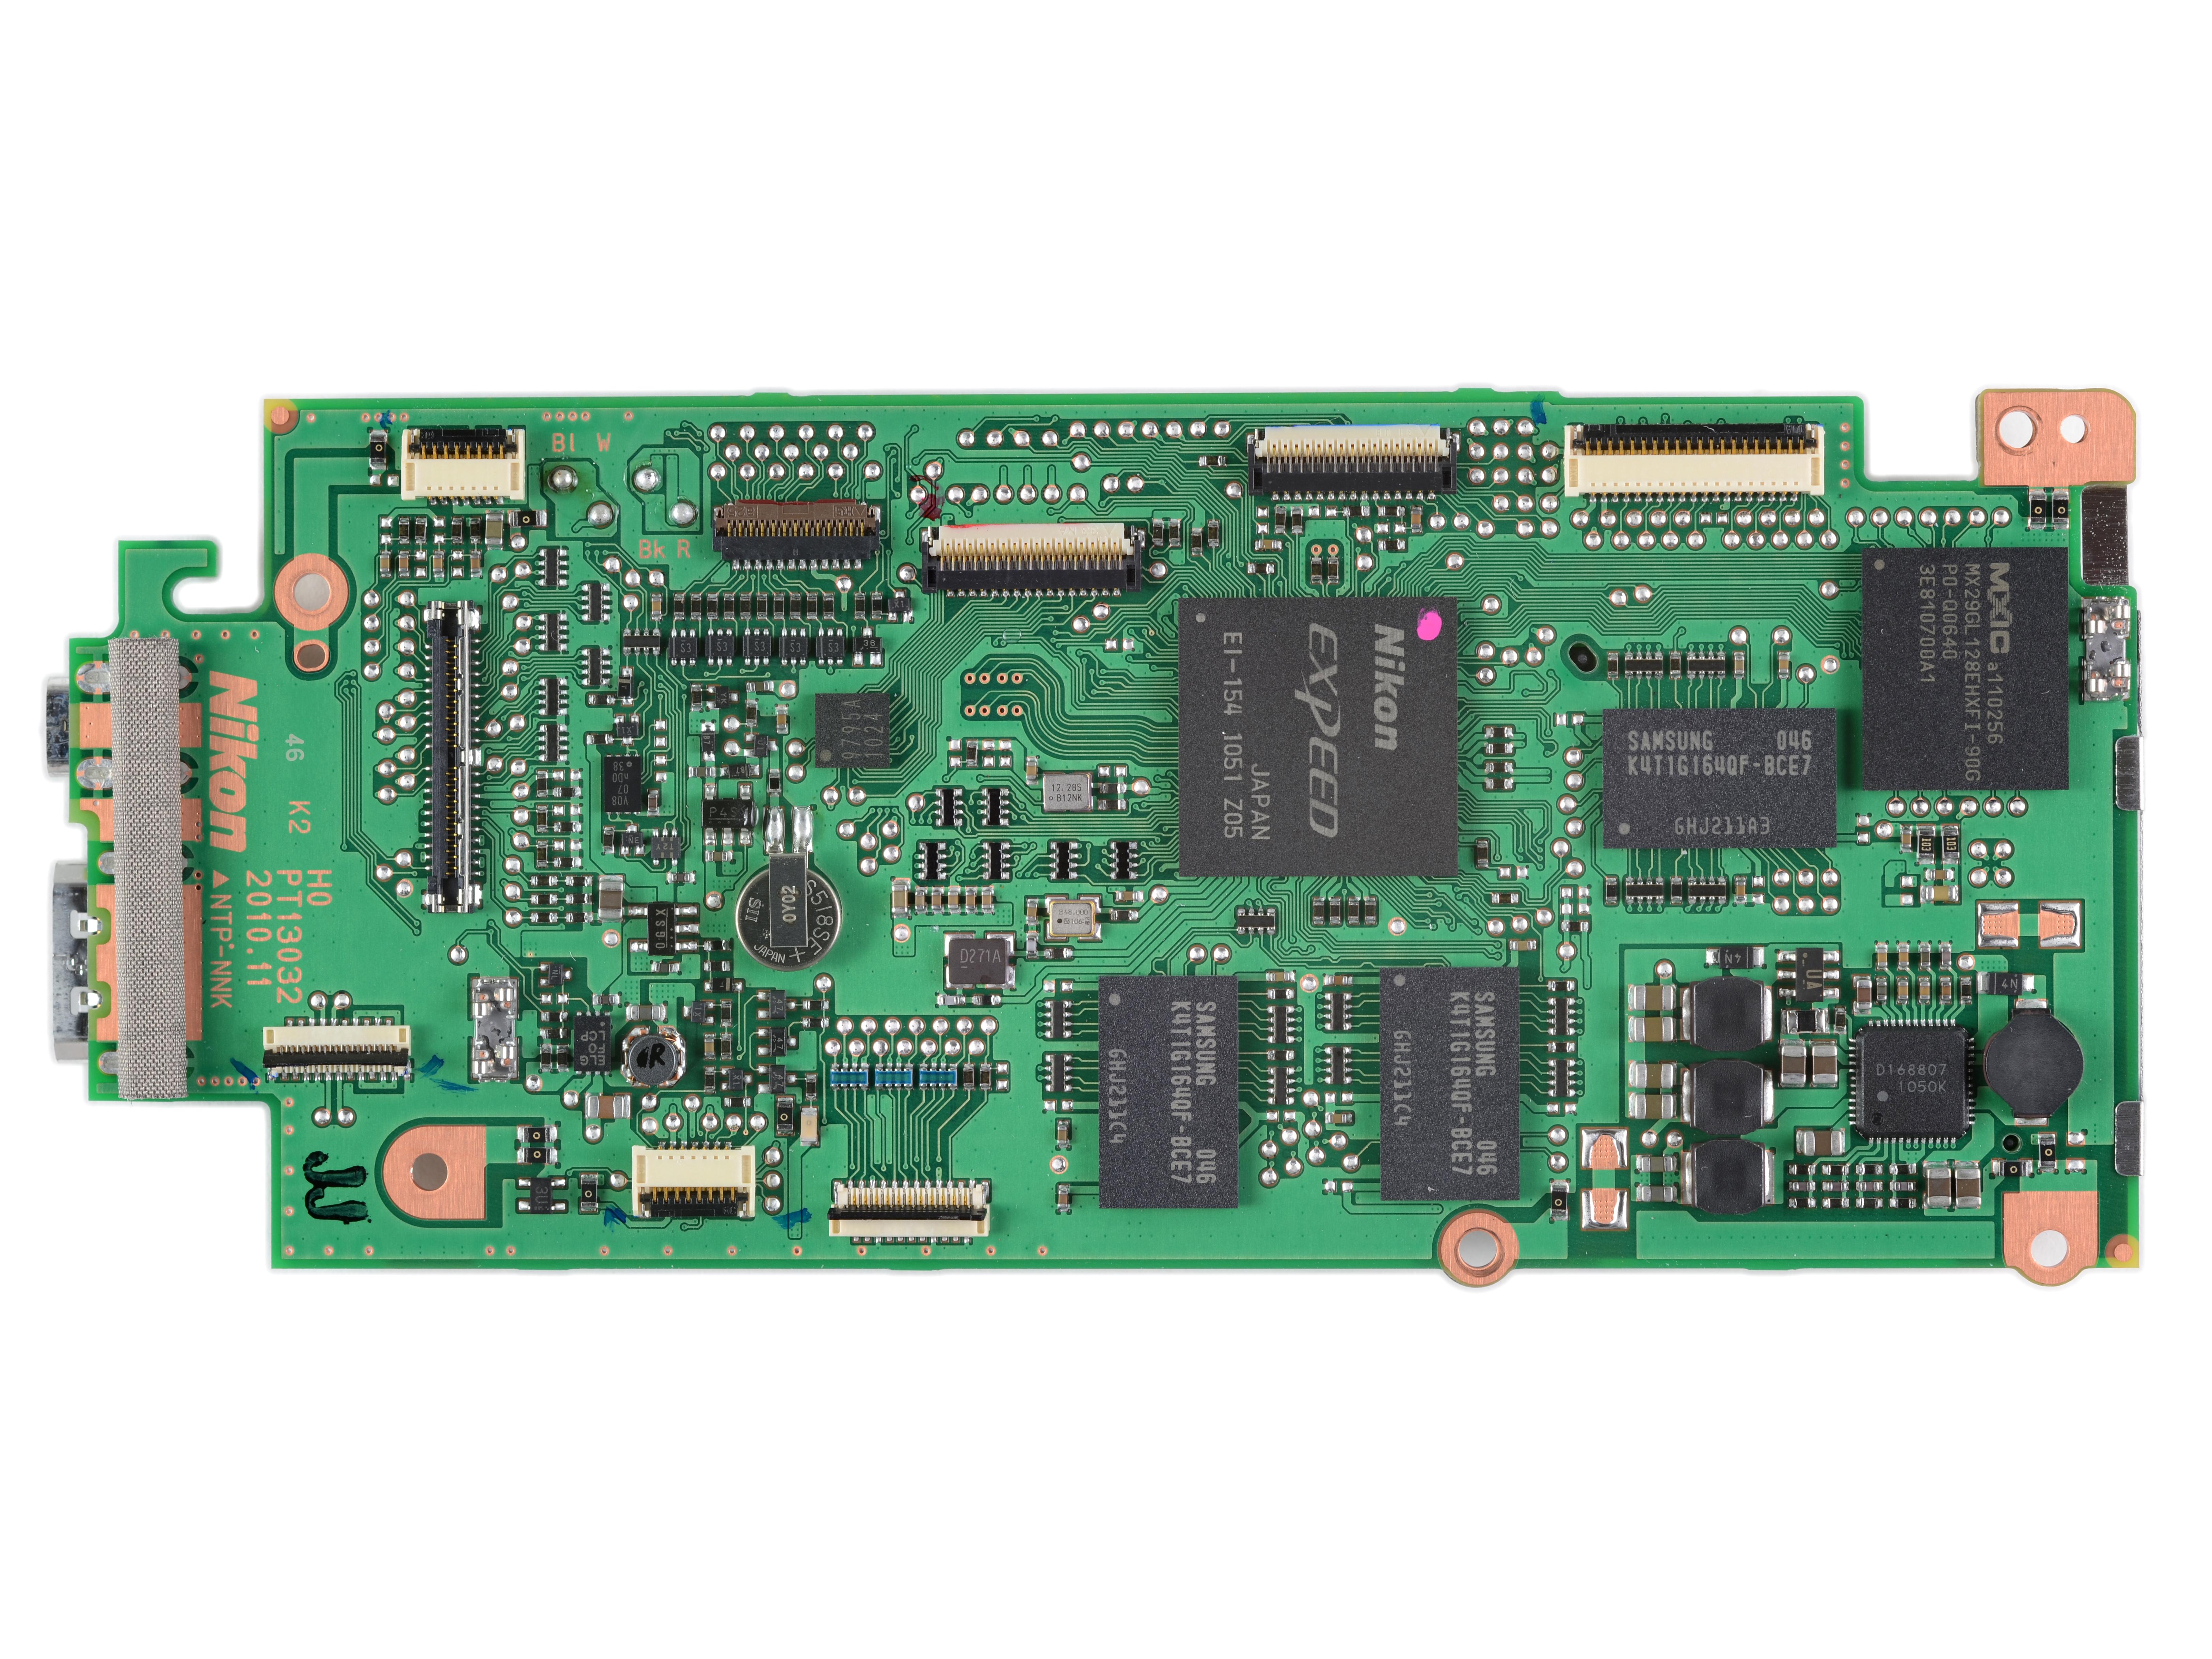 Nikon D5100 Teardown Ifixit Excellent Peelability Glue For Circuit Board Buy Step 7